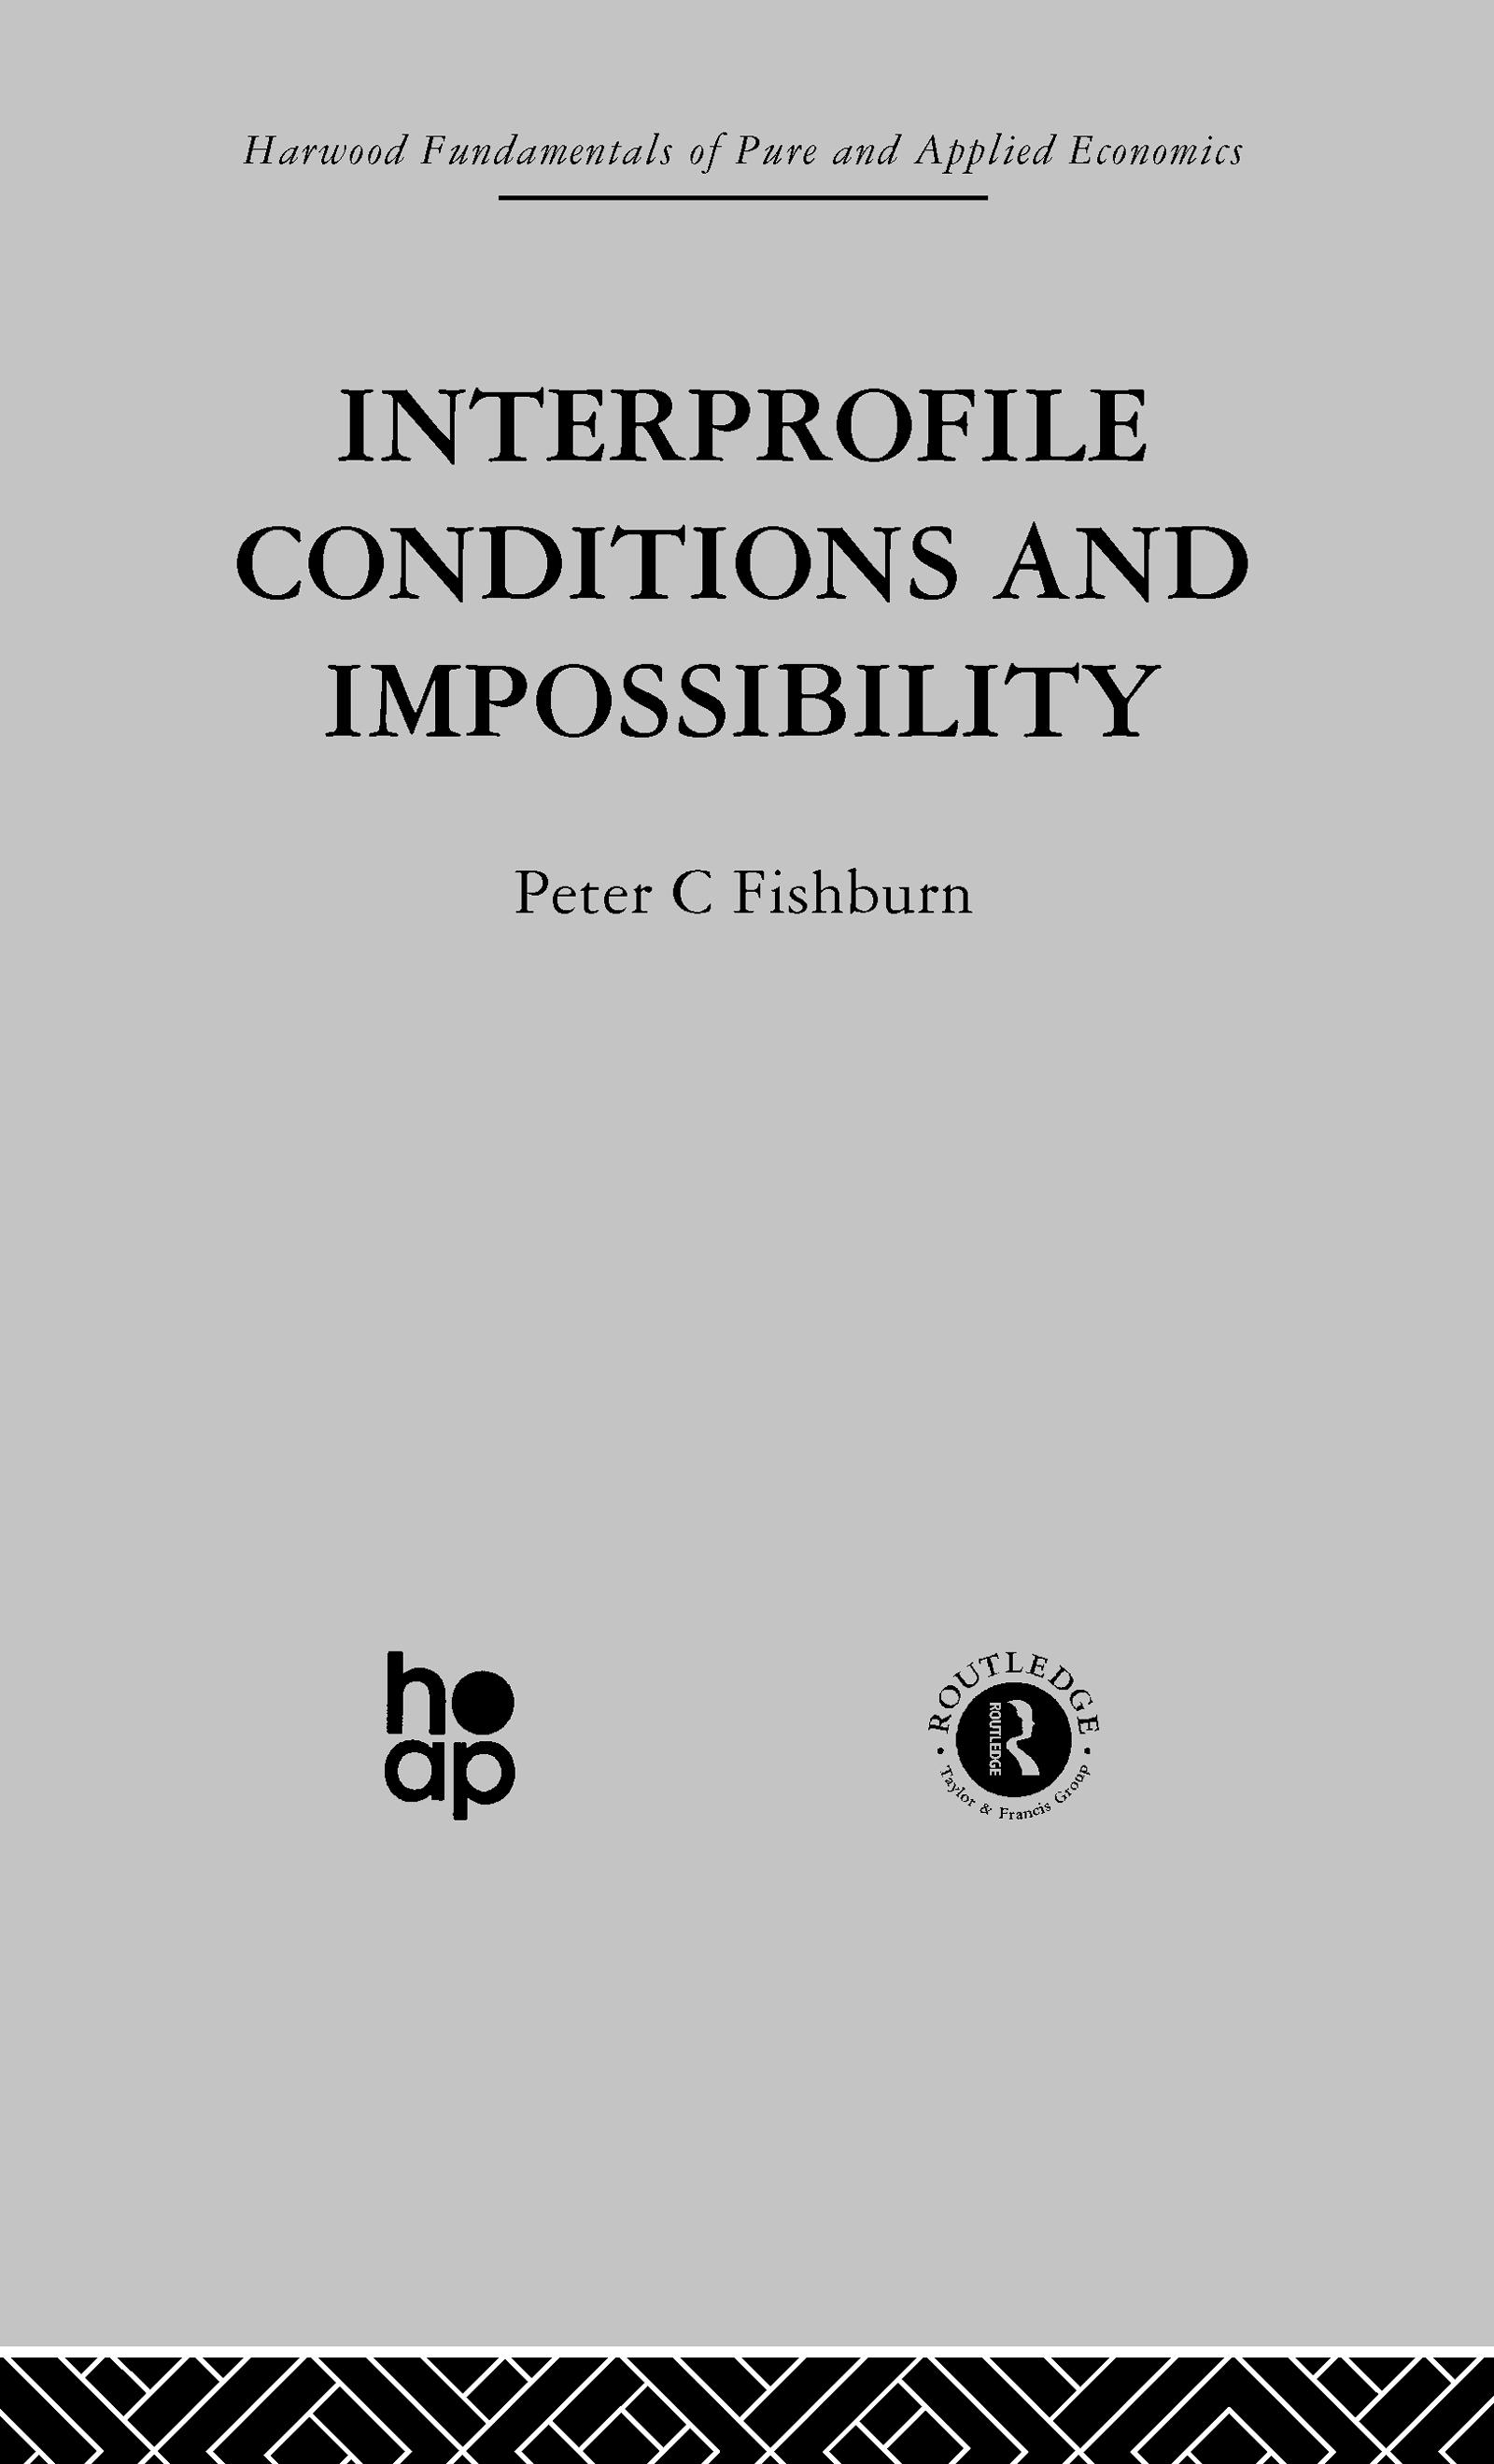 Interprofile Conditions and Impossibility